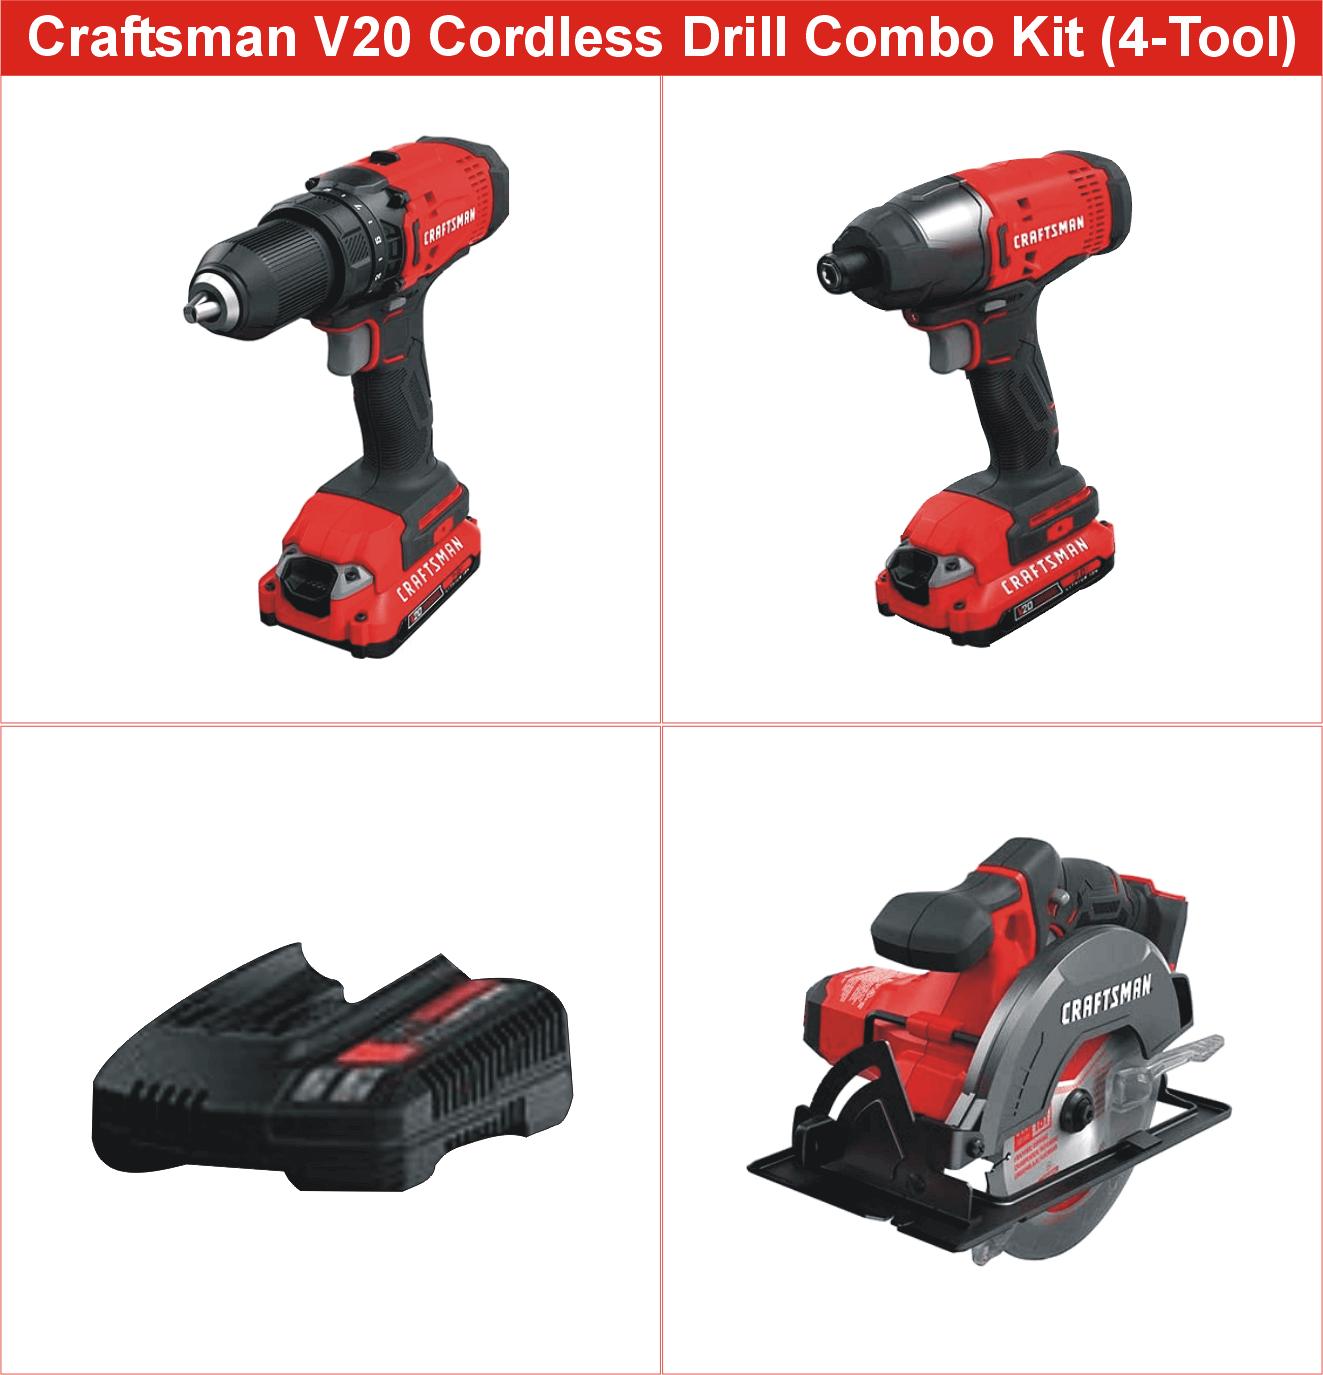 CRAFTSMAN V20 Cordless Drill Combo Kit